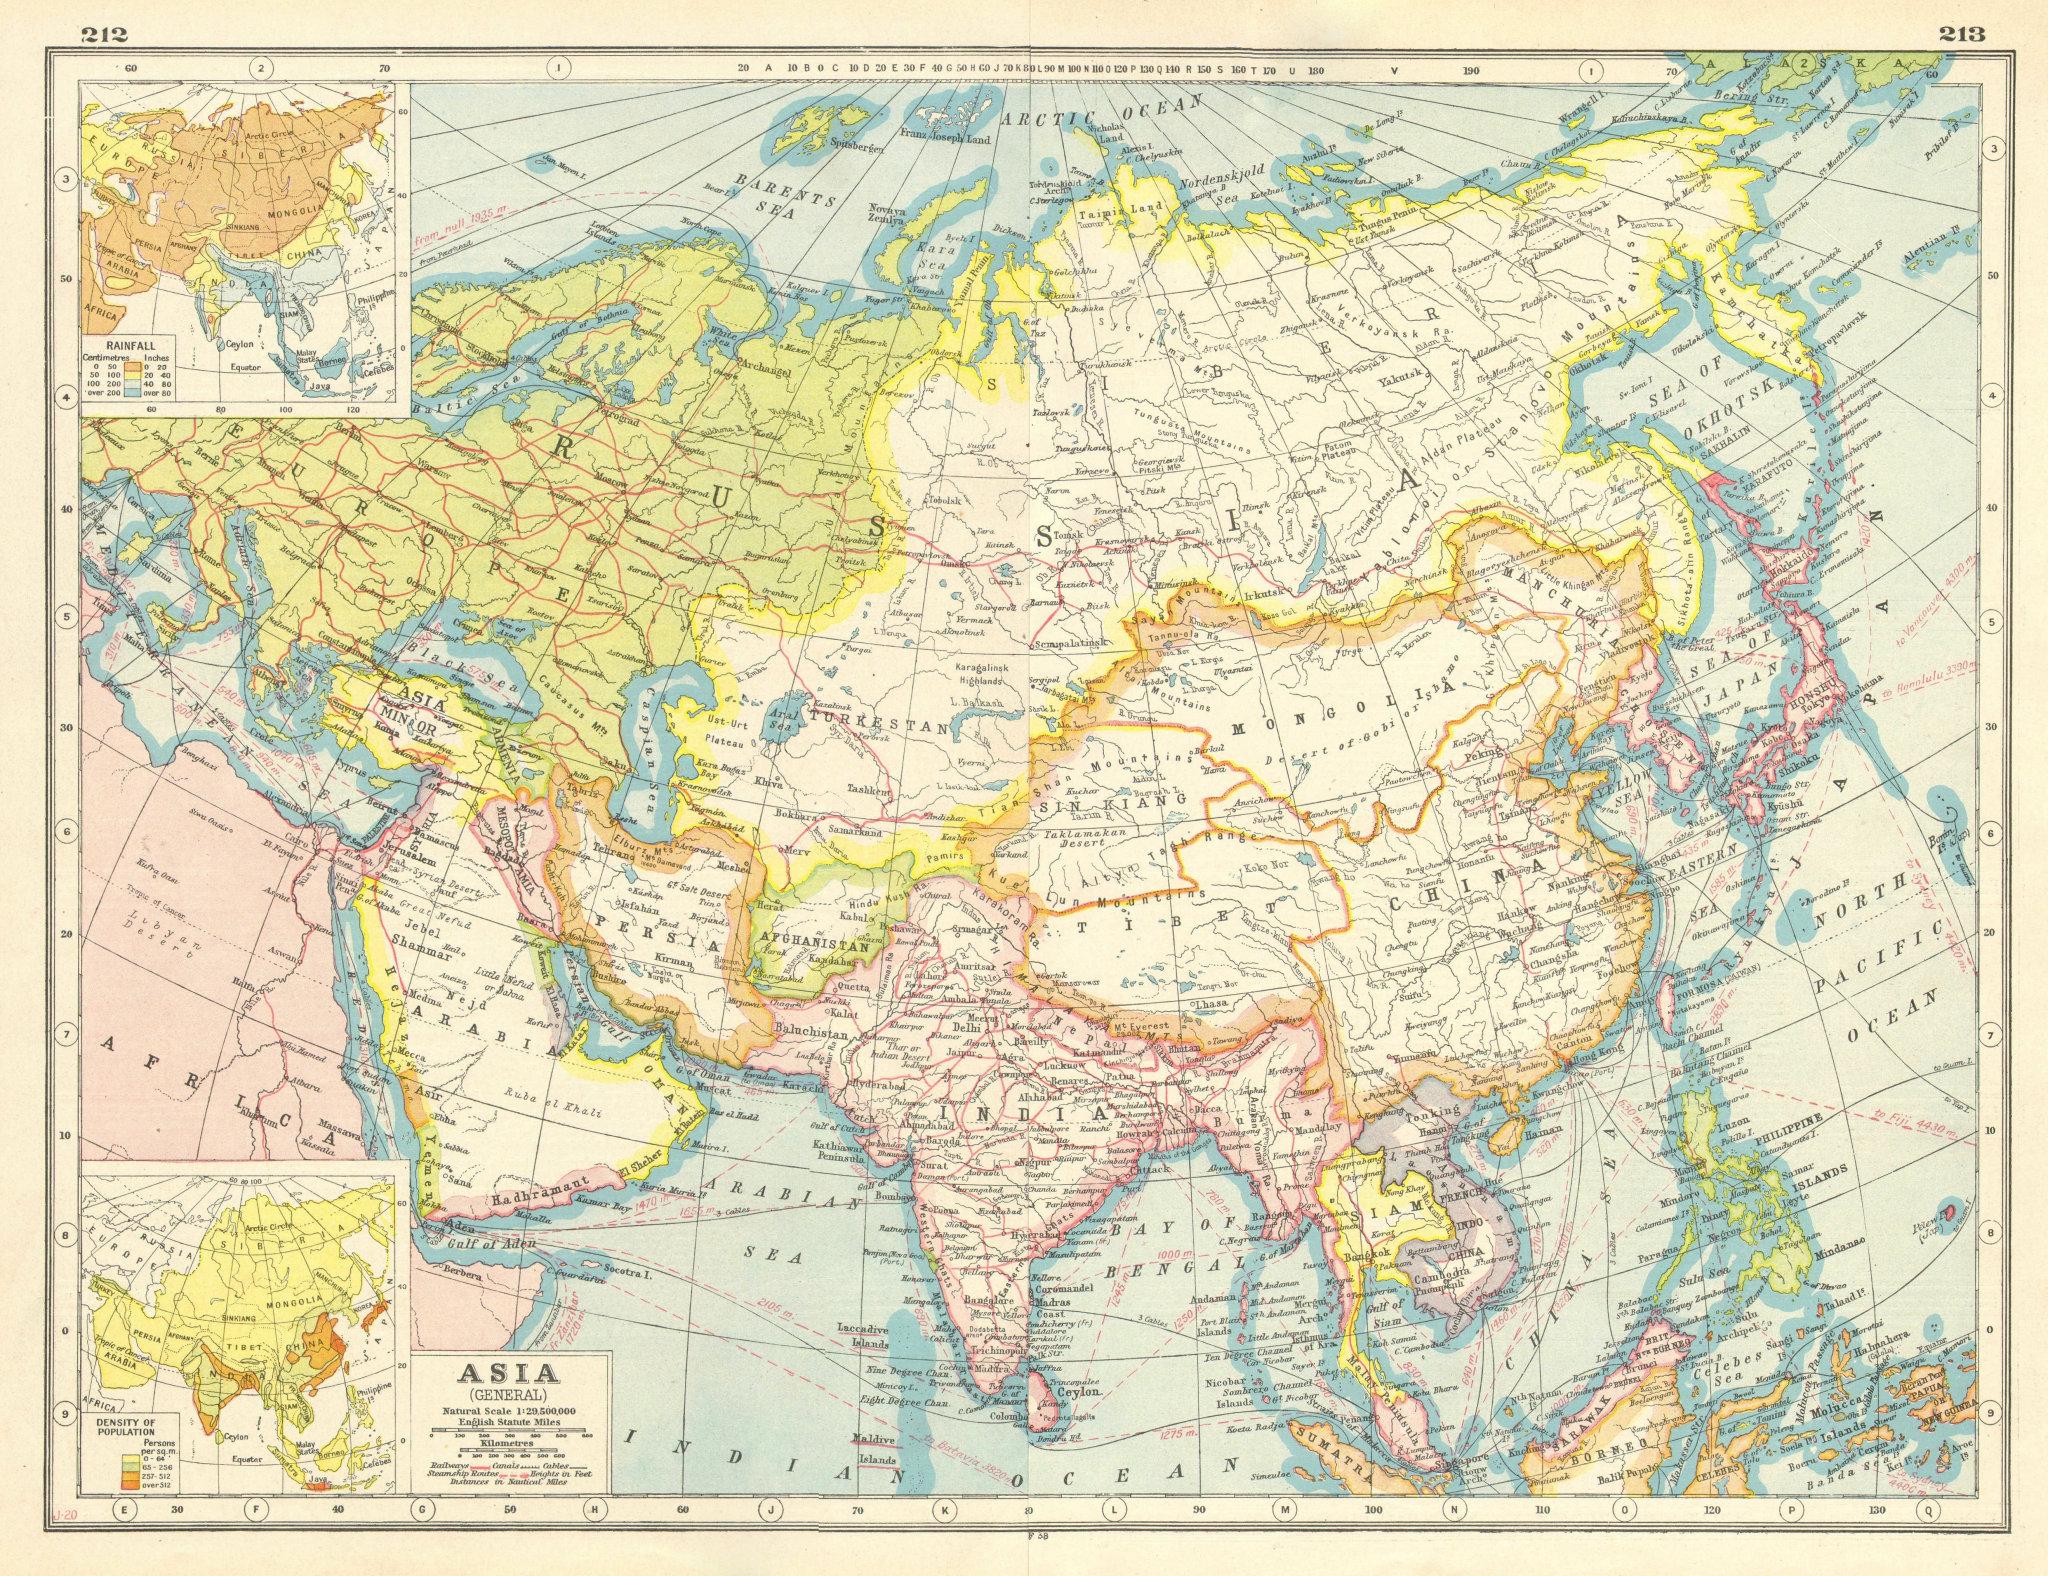 Associate Product ASIA. Mesopotamia Asir Hejaz El Hasa Persia Siam Chosen Fr. Indochina 1920 map